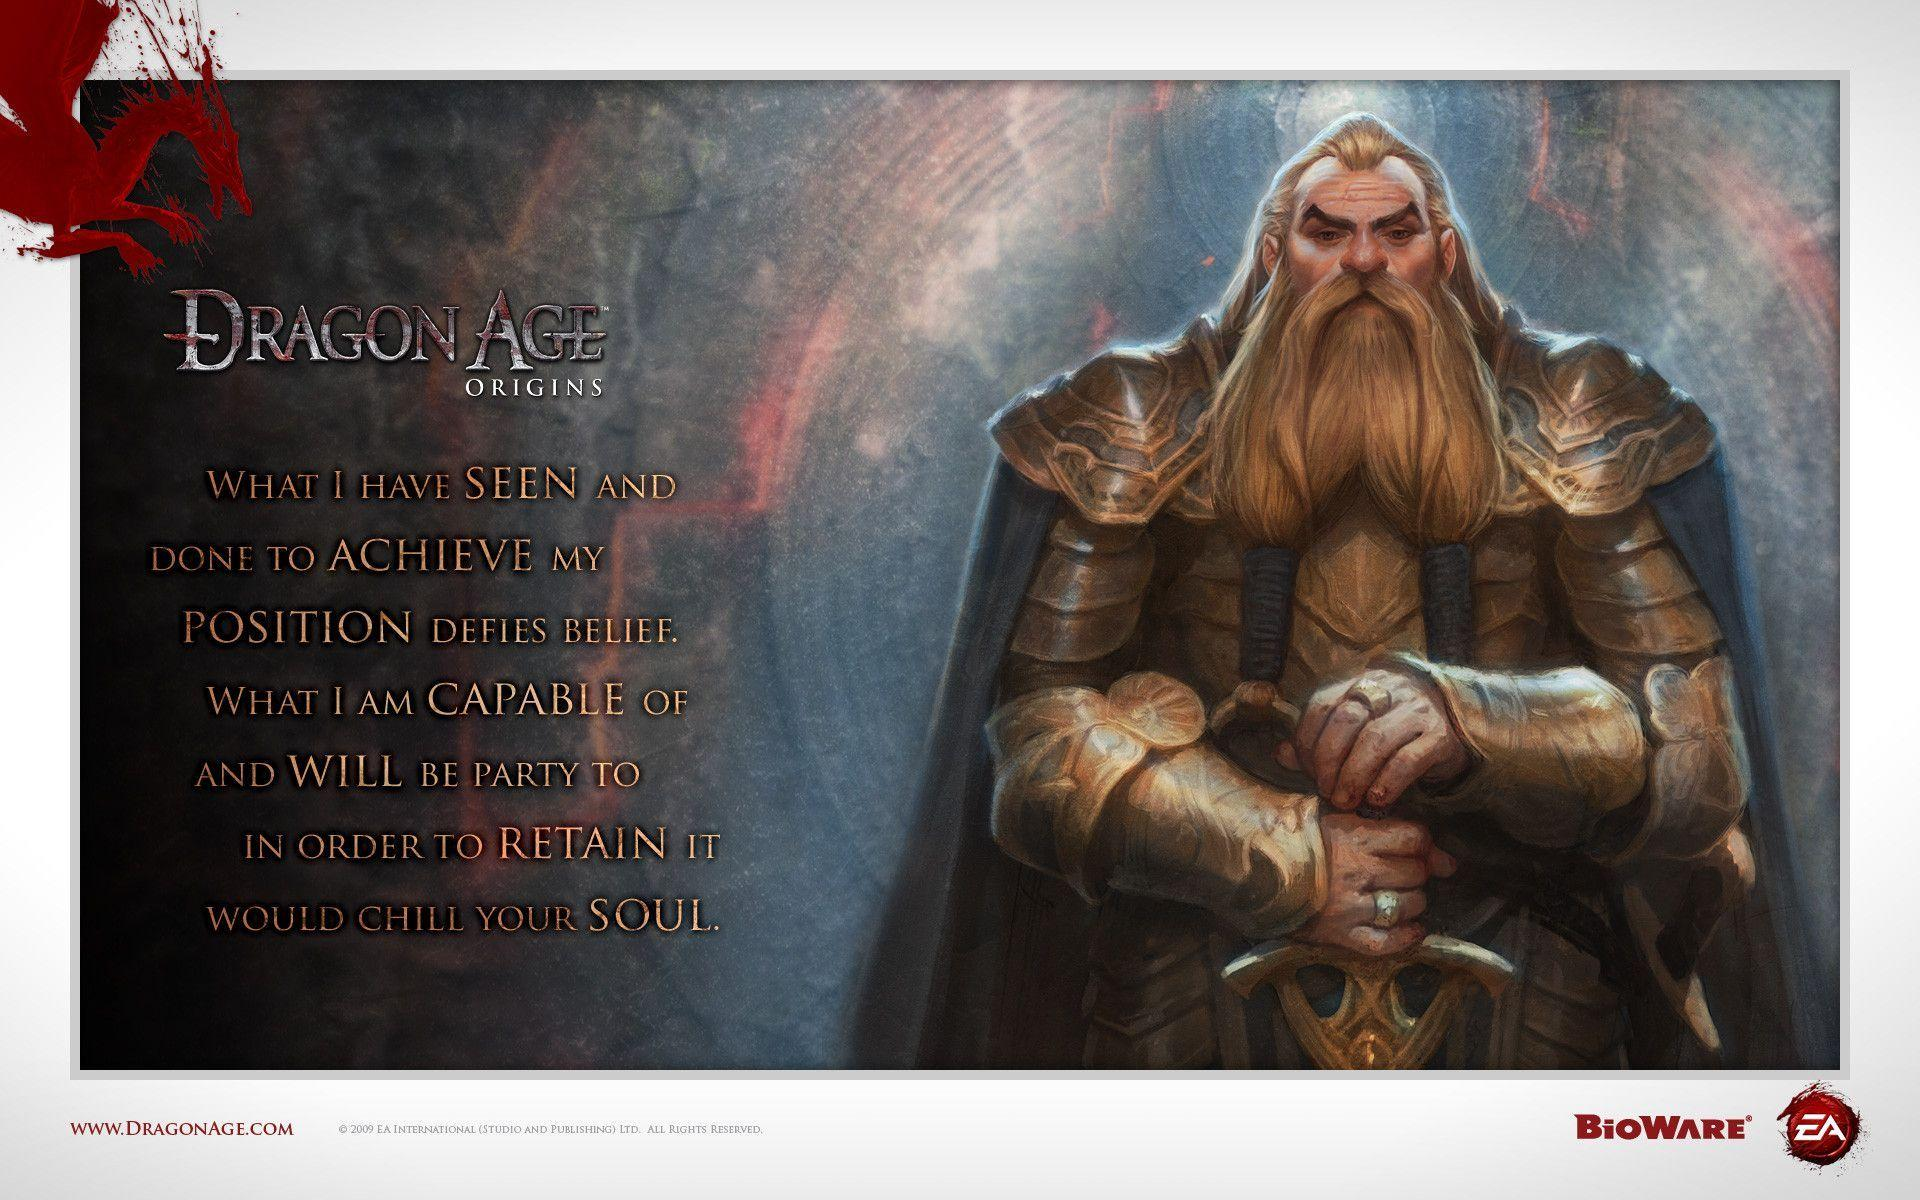 Dragon Age Origins Wallpapers HD - Wallpaper Cave